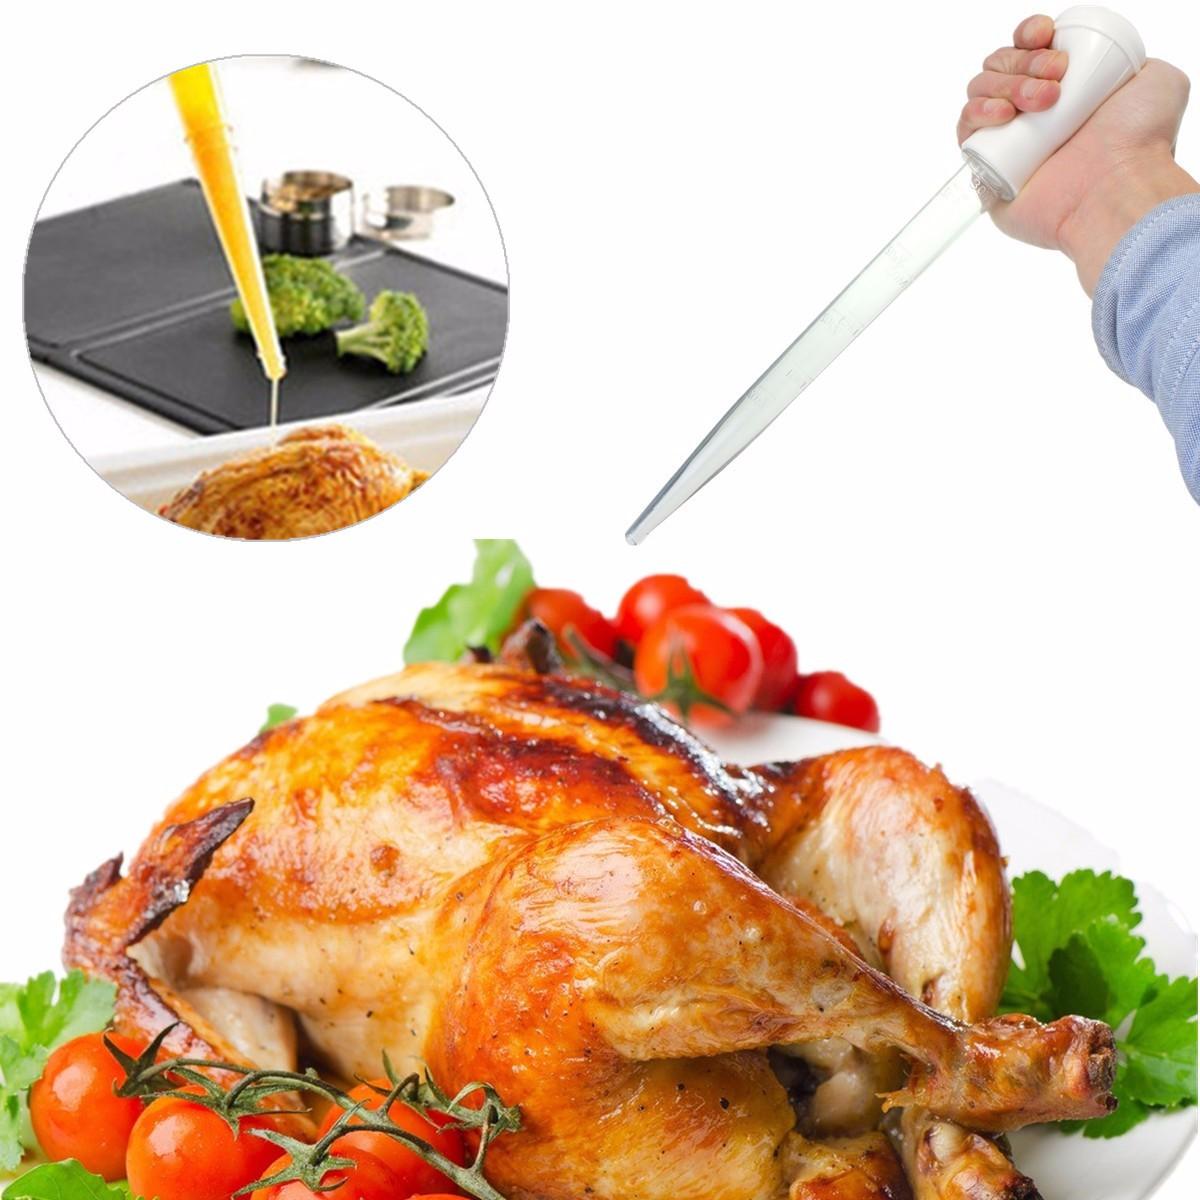 sauce saveur marinade seringue aiguille injecteur r ti viande cuisine barbecue achat vente. Black Bedroom Furniture Sets. Home Design Ideas